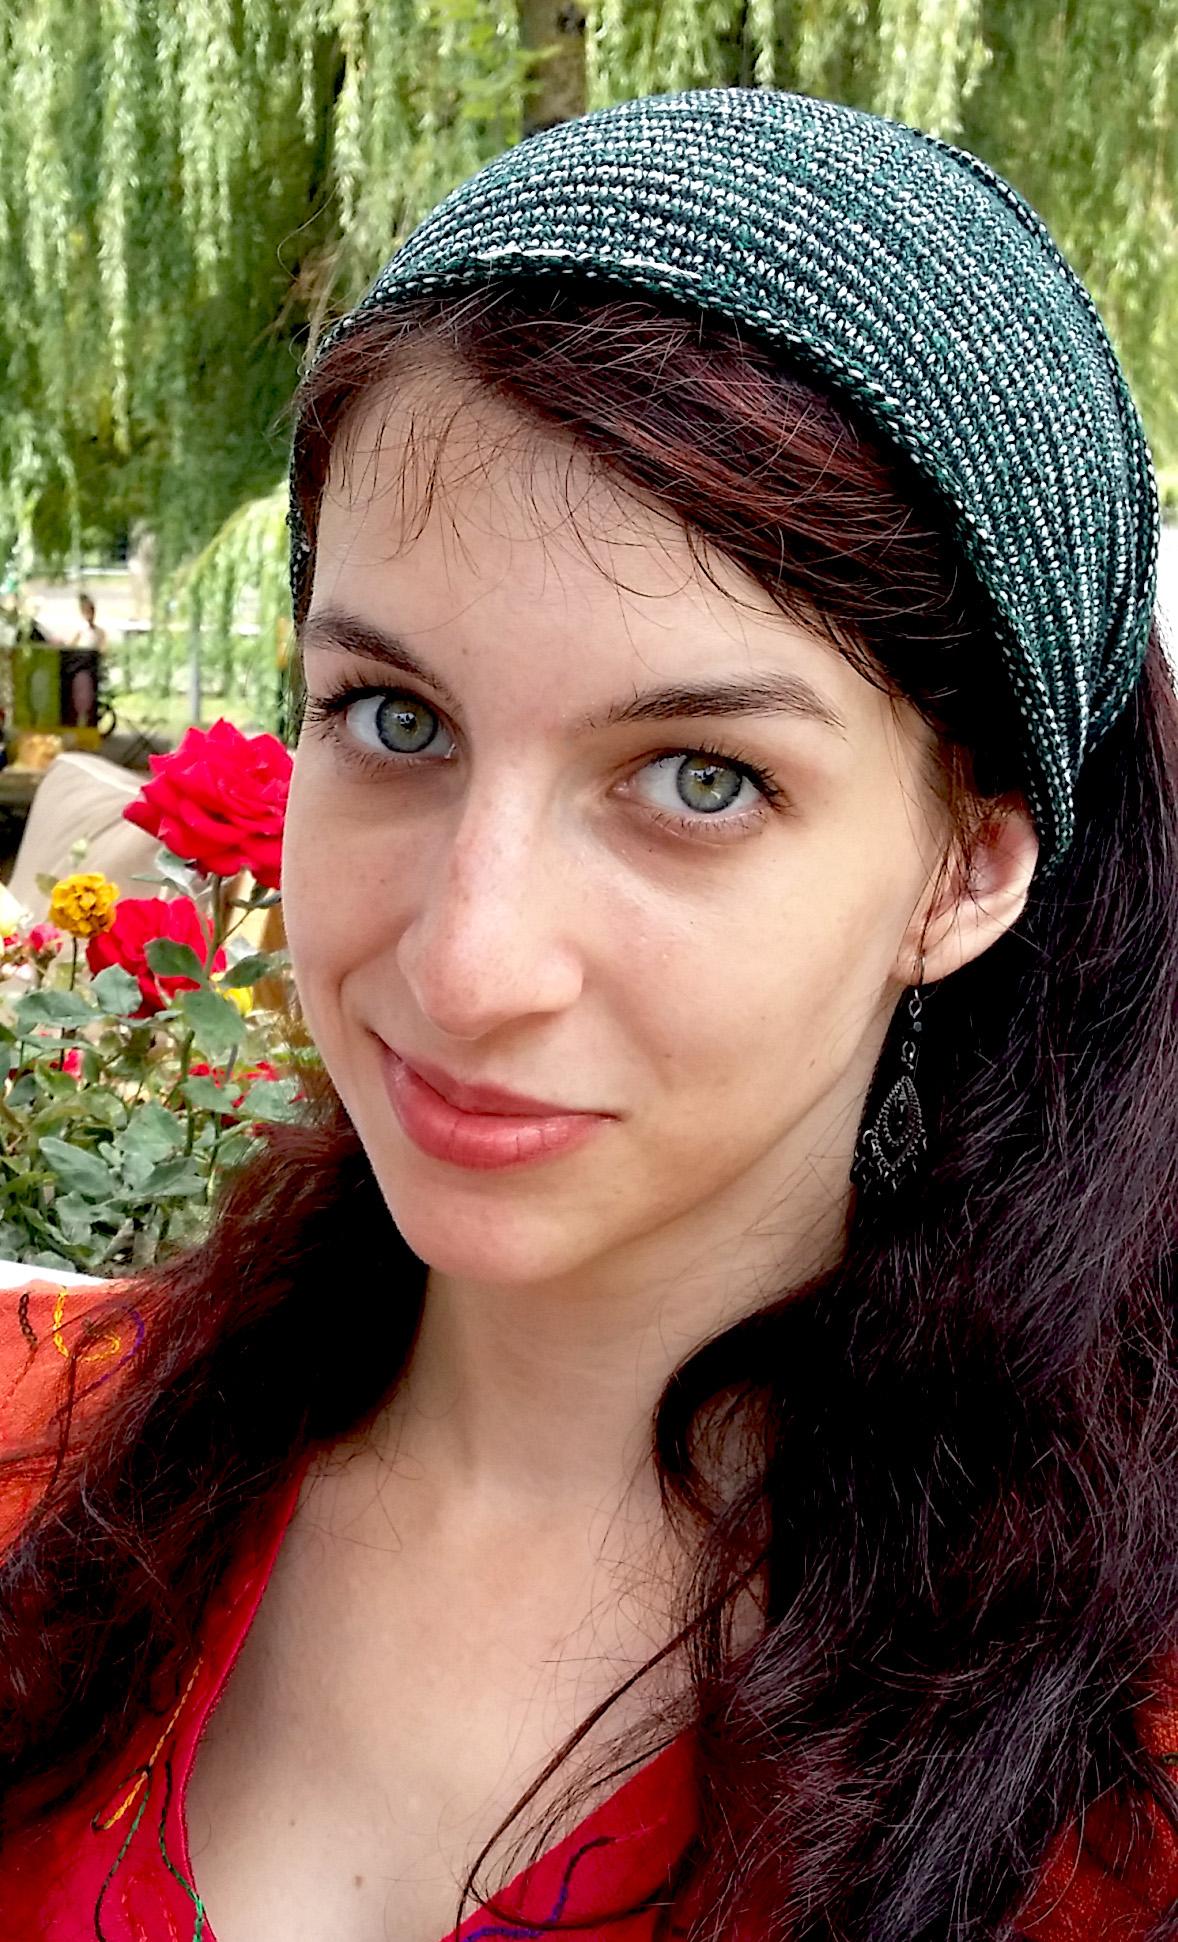 Andreea Alexandru